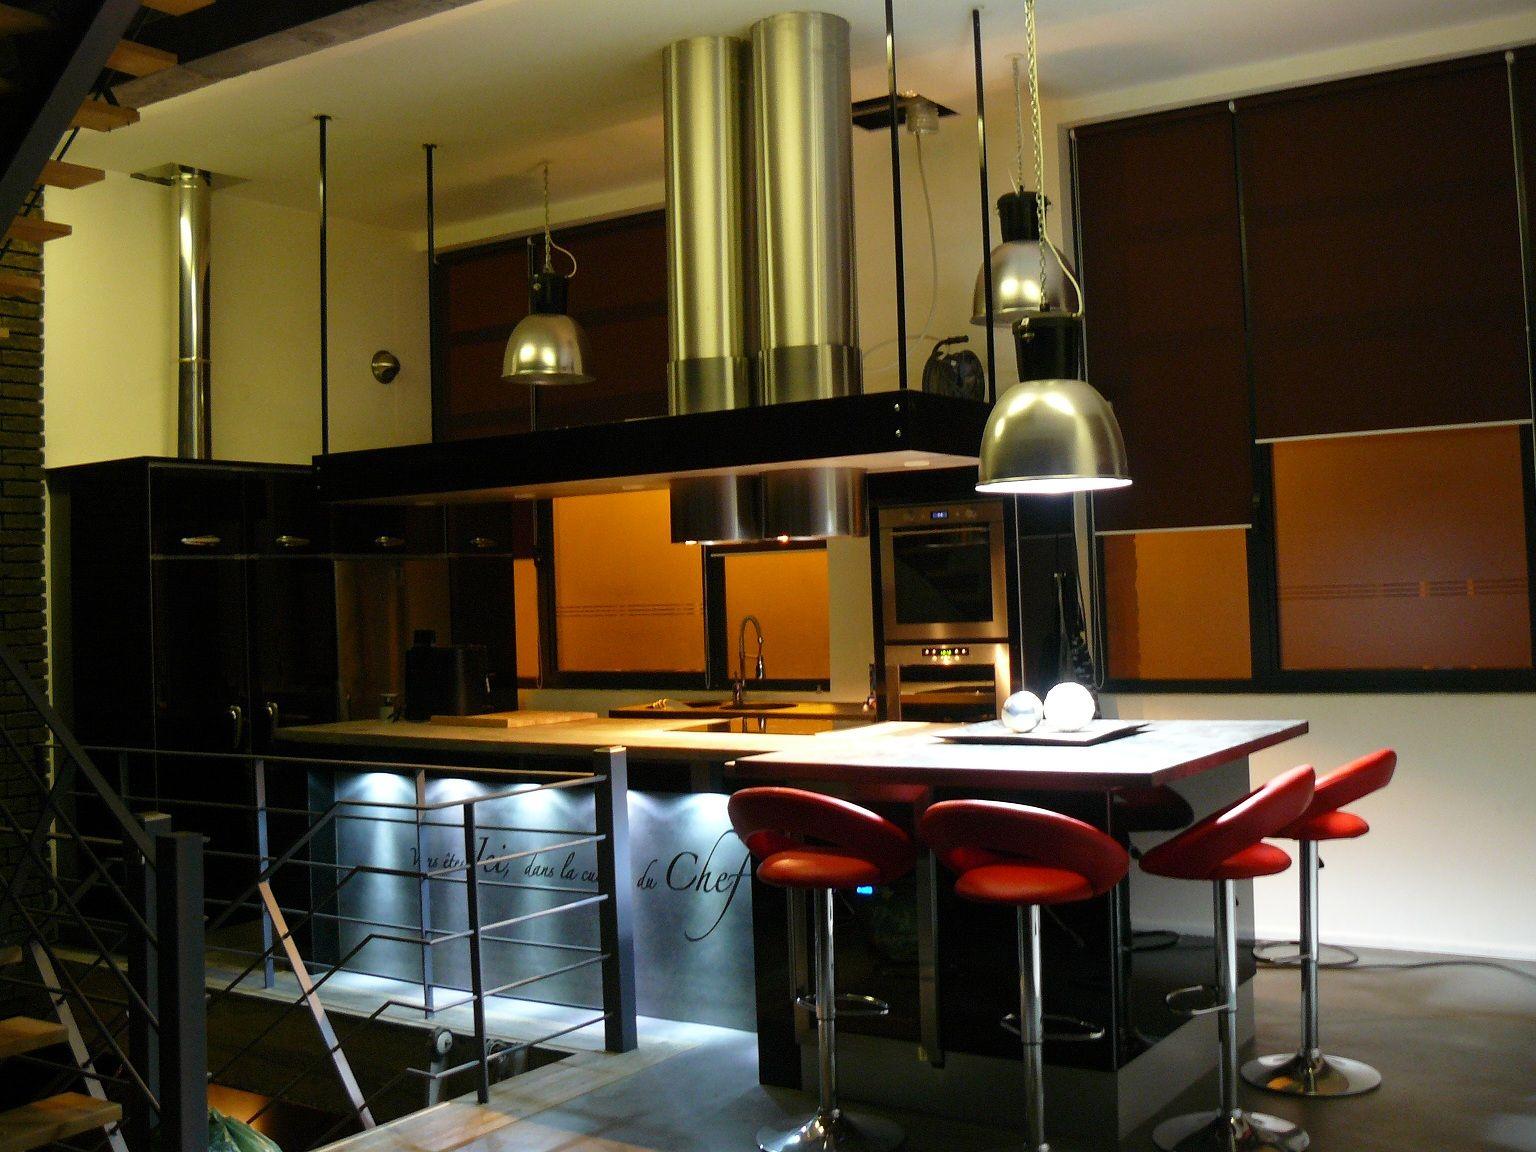 Îlot de cuisine grand format 4m x 1m50.  small island of kitchen